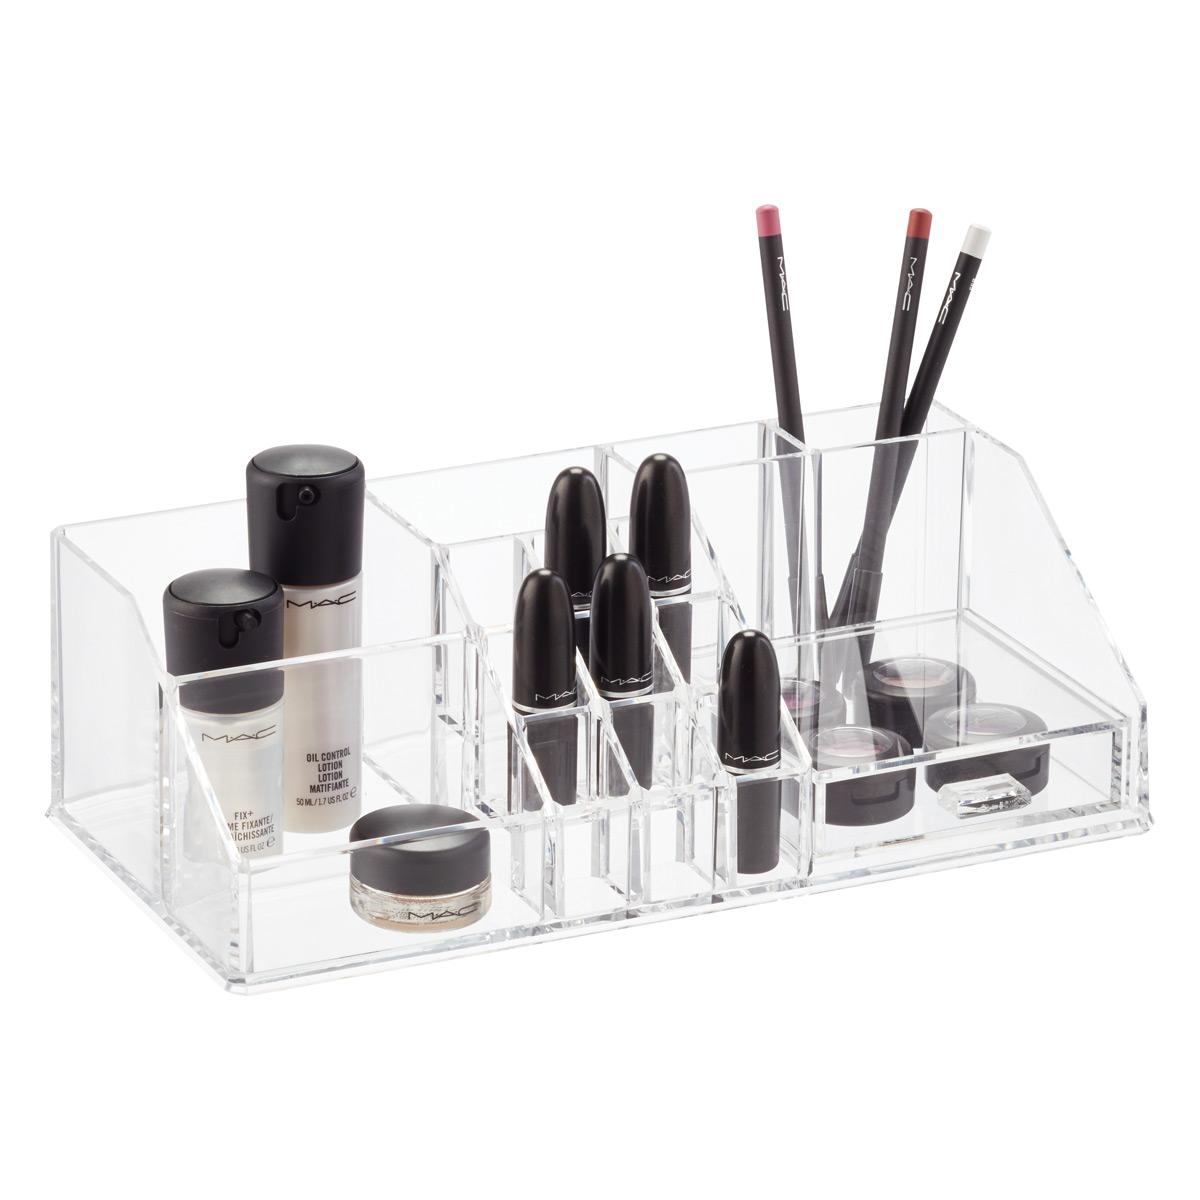 Acrylic Makeup Organizer With Drawer